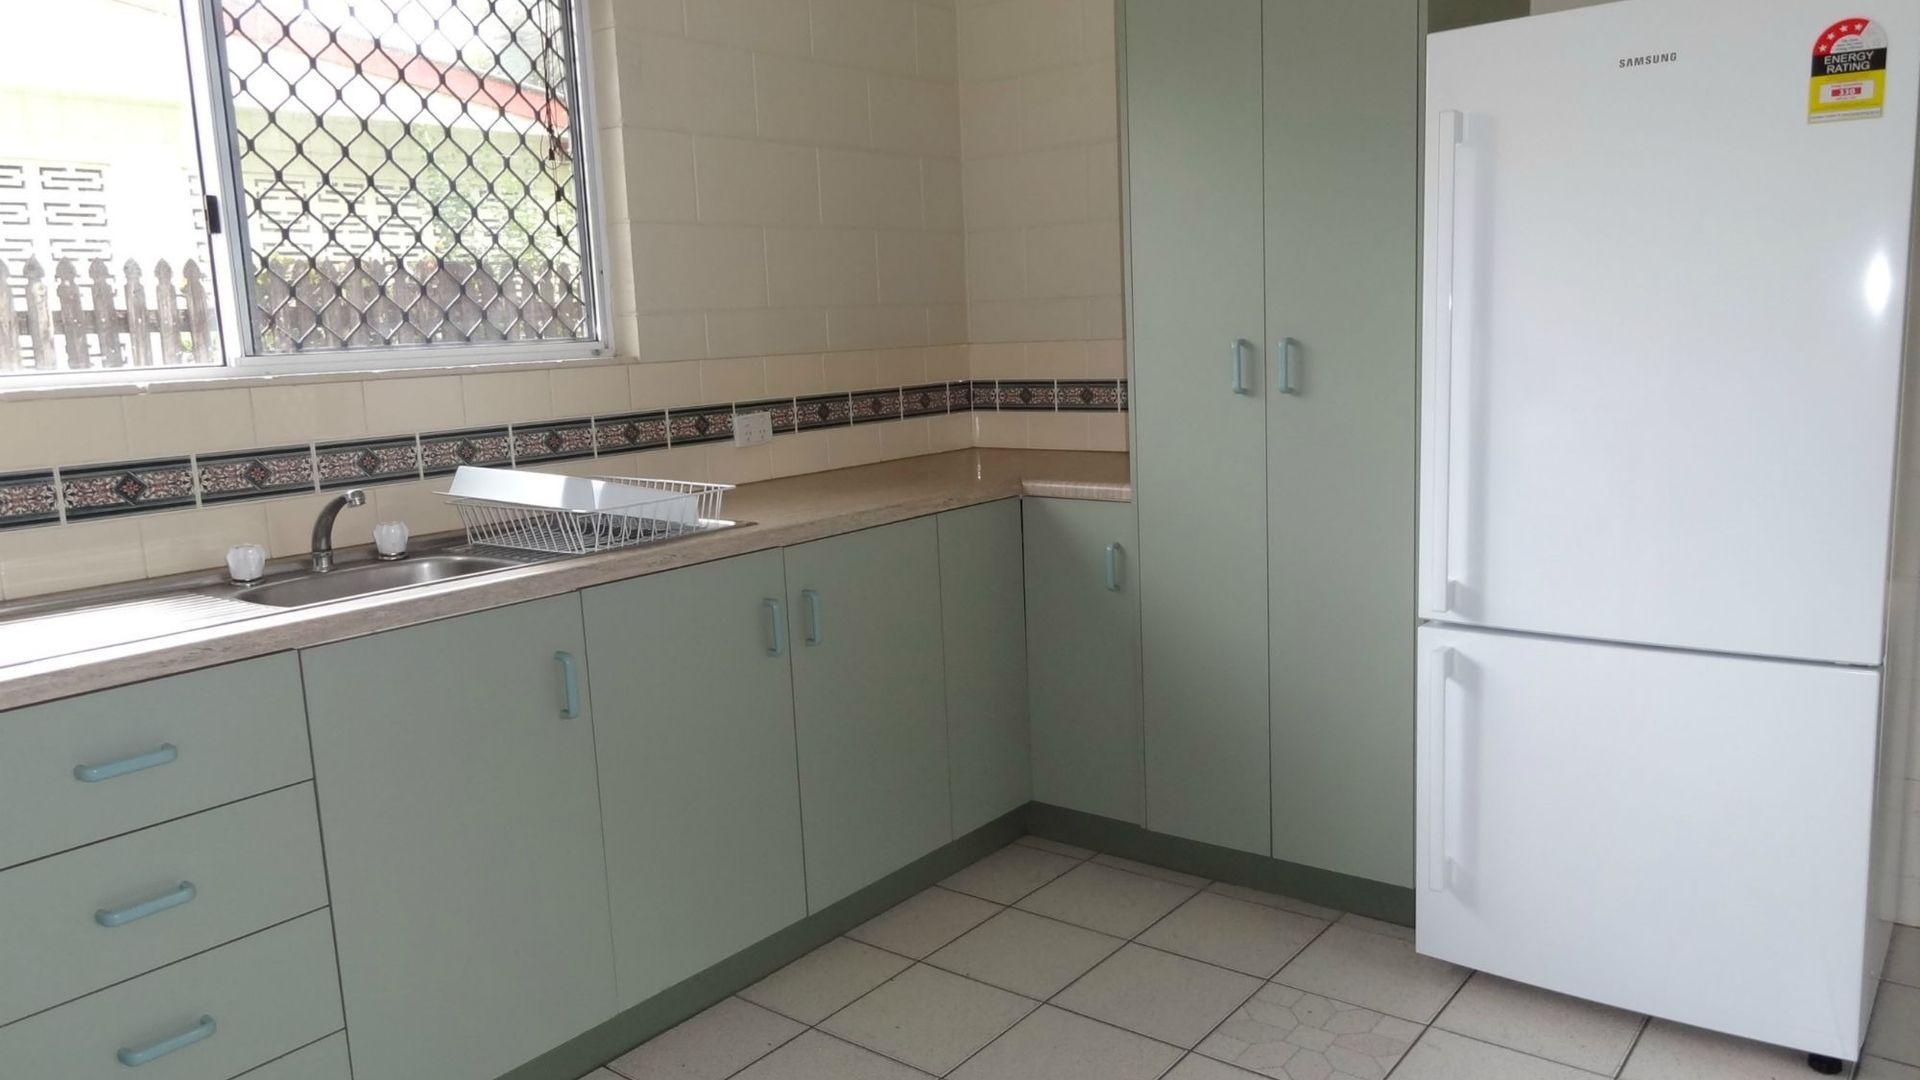 Unit 1/231 Victoria Street, Cardwell QLD 4849, Image 2